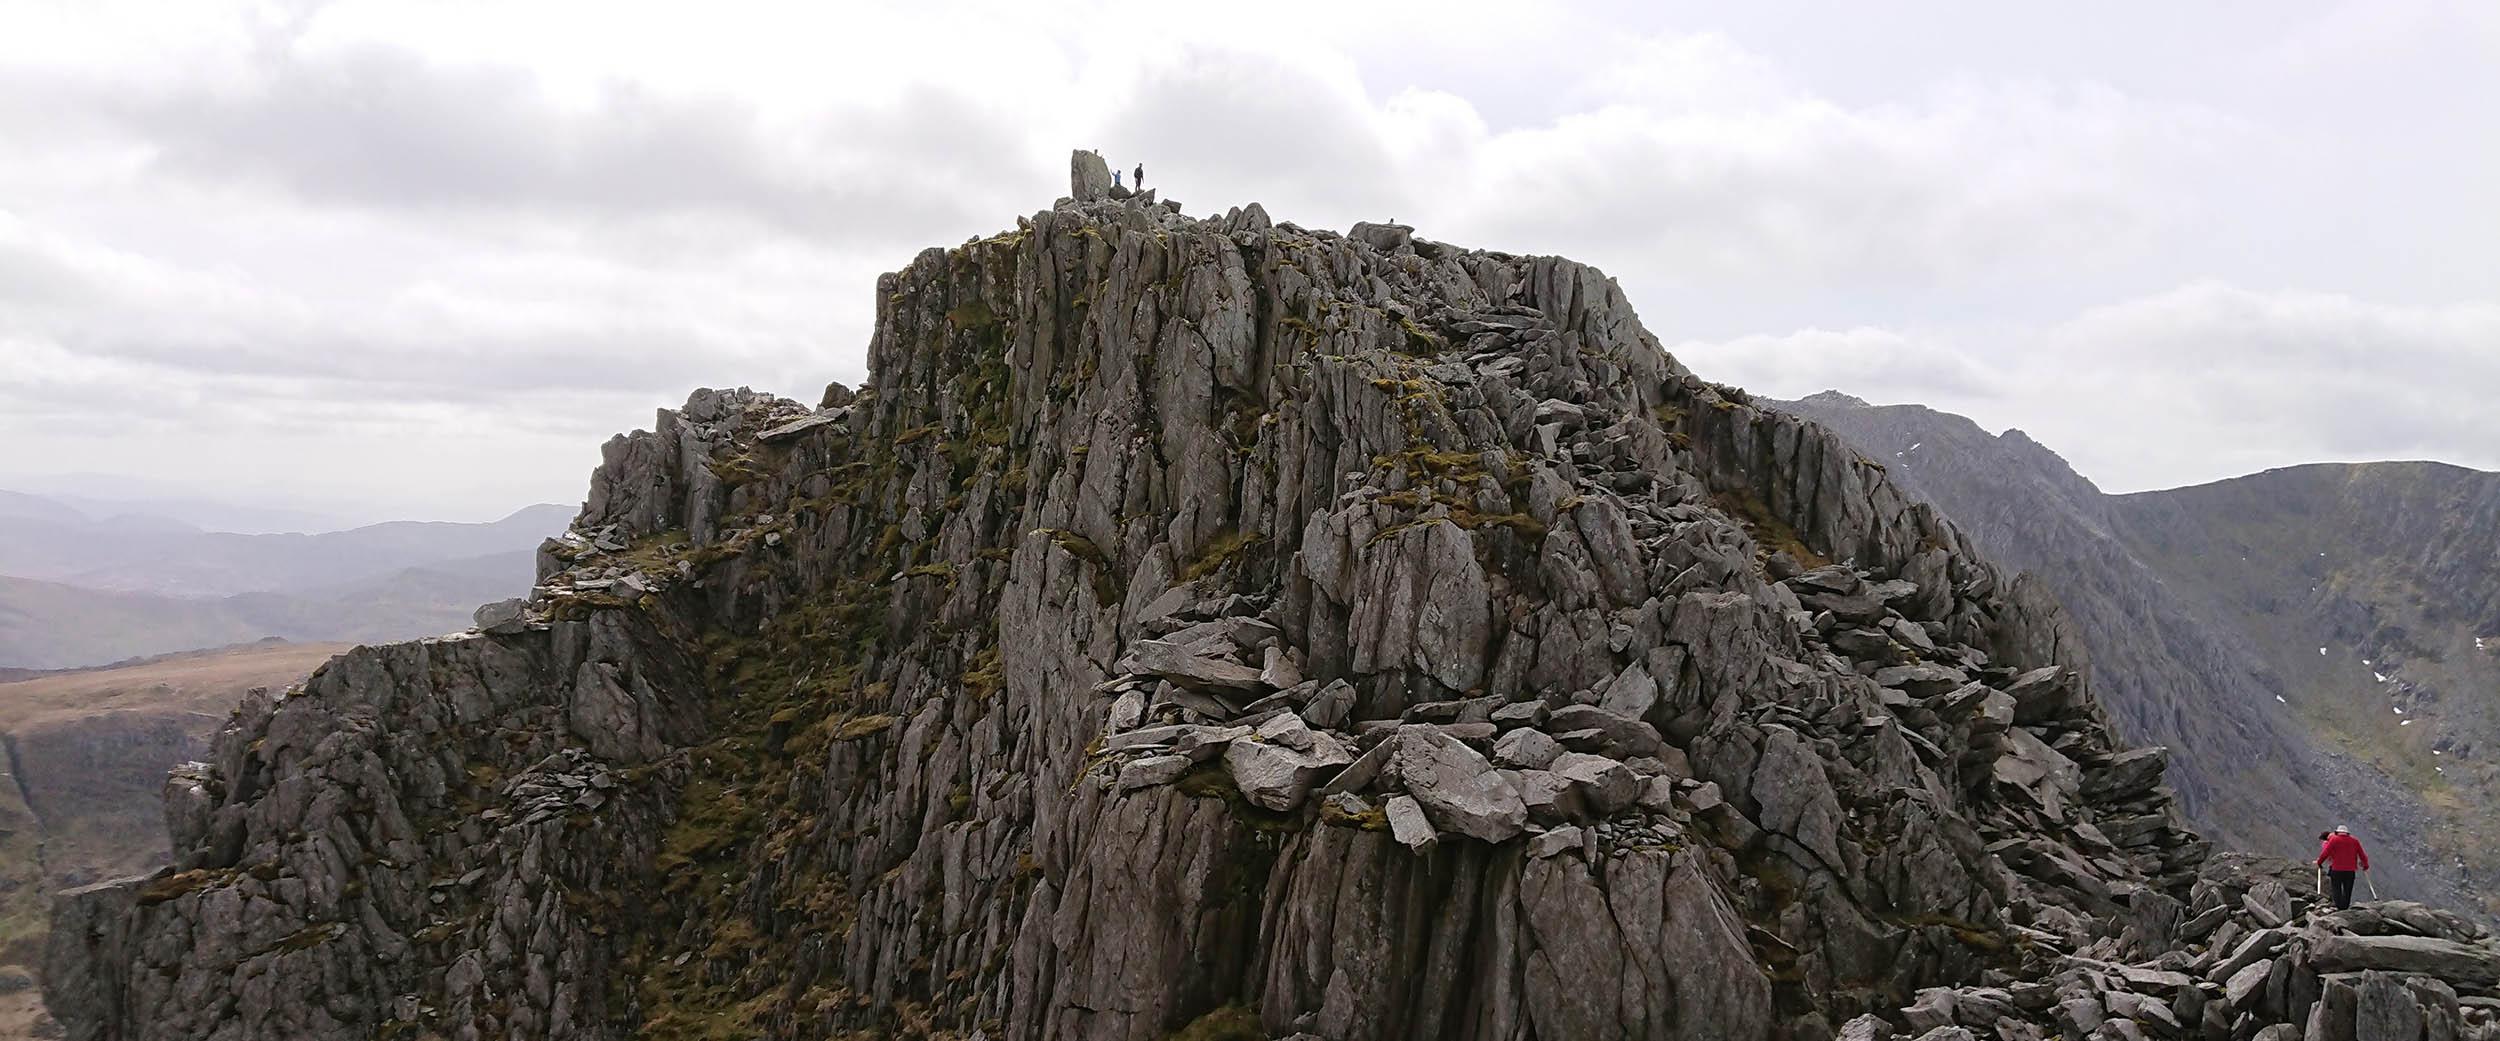 Looking towards the summit of Tryfan